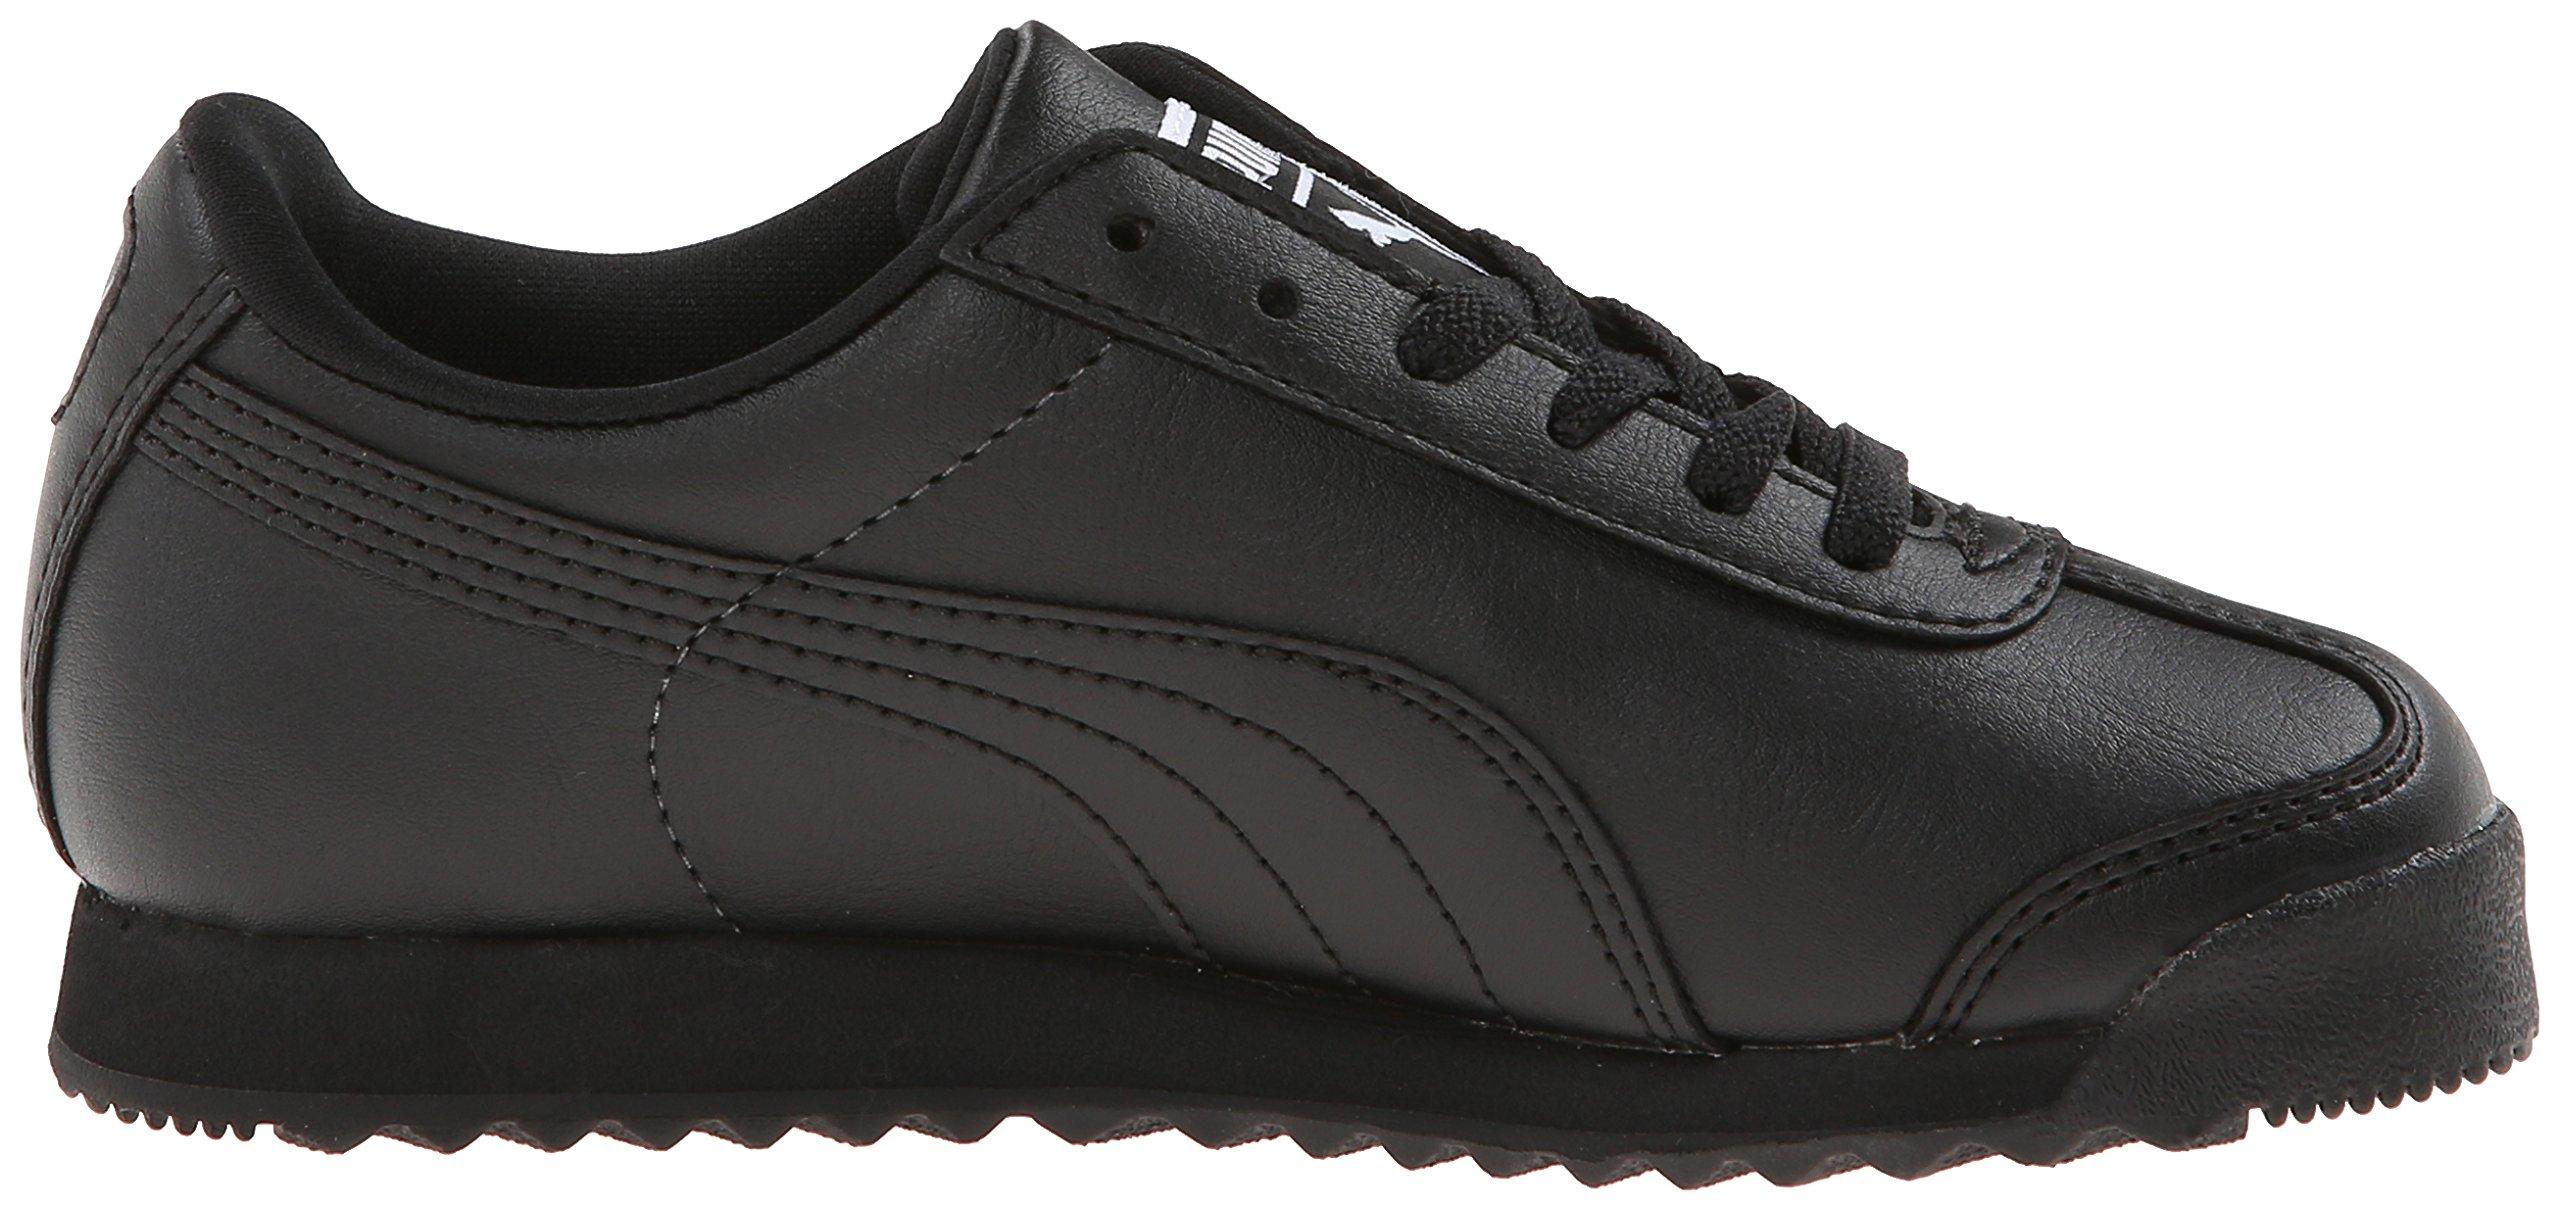 PUMA Roma Basic JR Sneaker , Black/Black, 1 M US Little Kid by PUMA (Image #7)